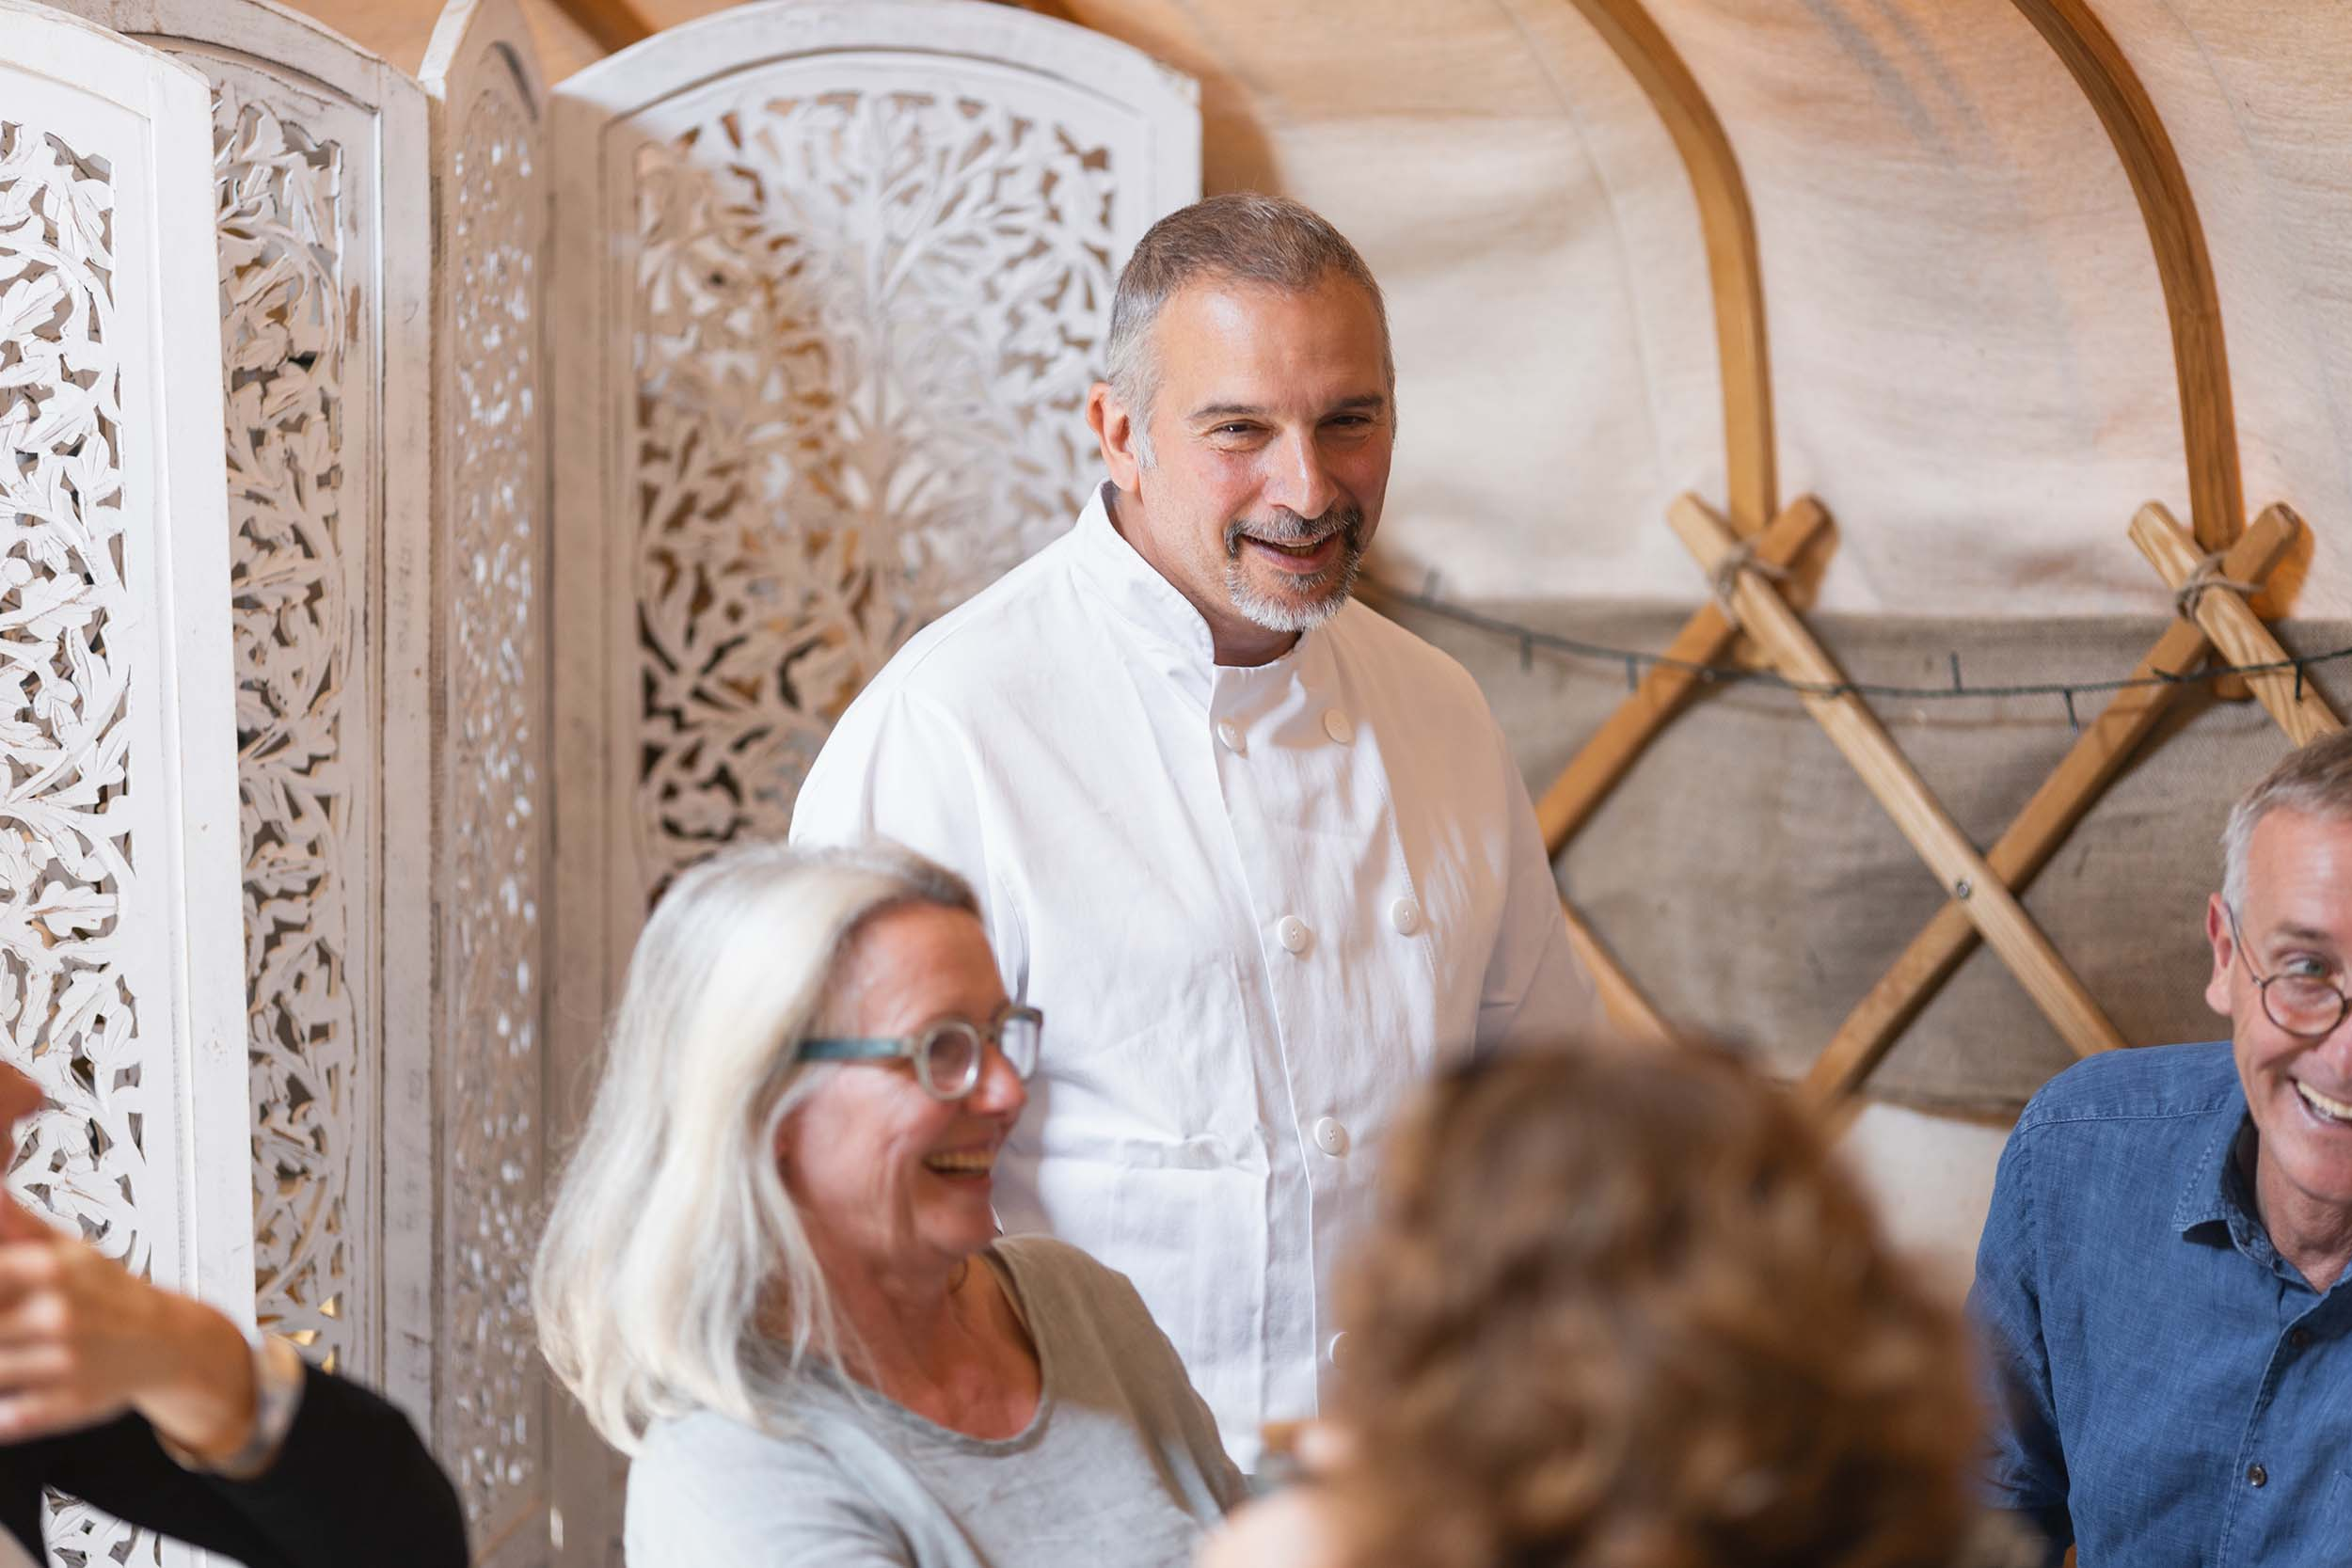 Enrico Ramaglia - Head Chef at the Yurt at Nicholsons